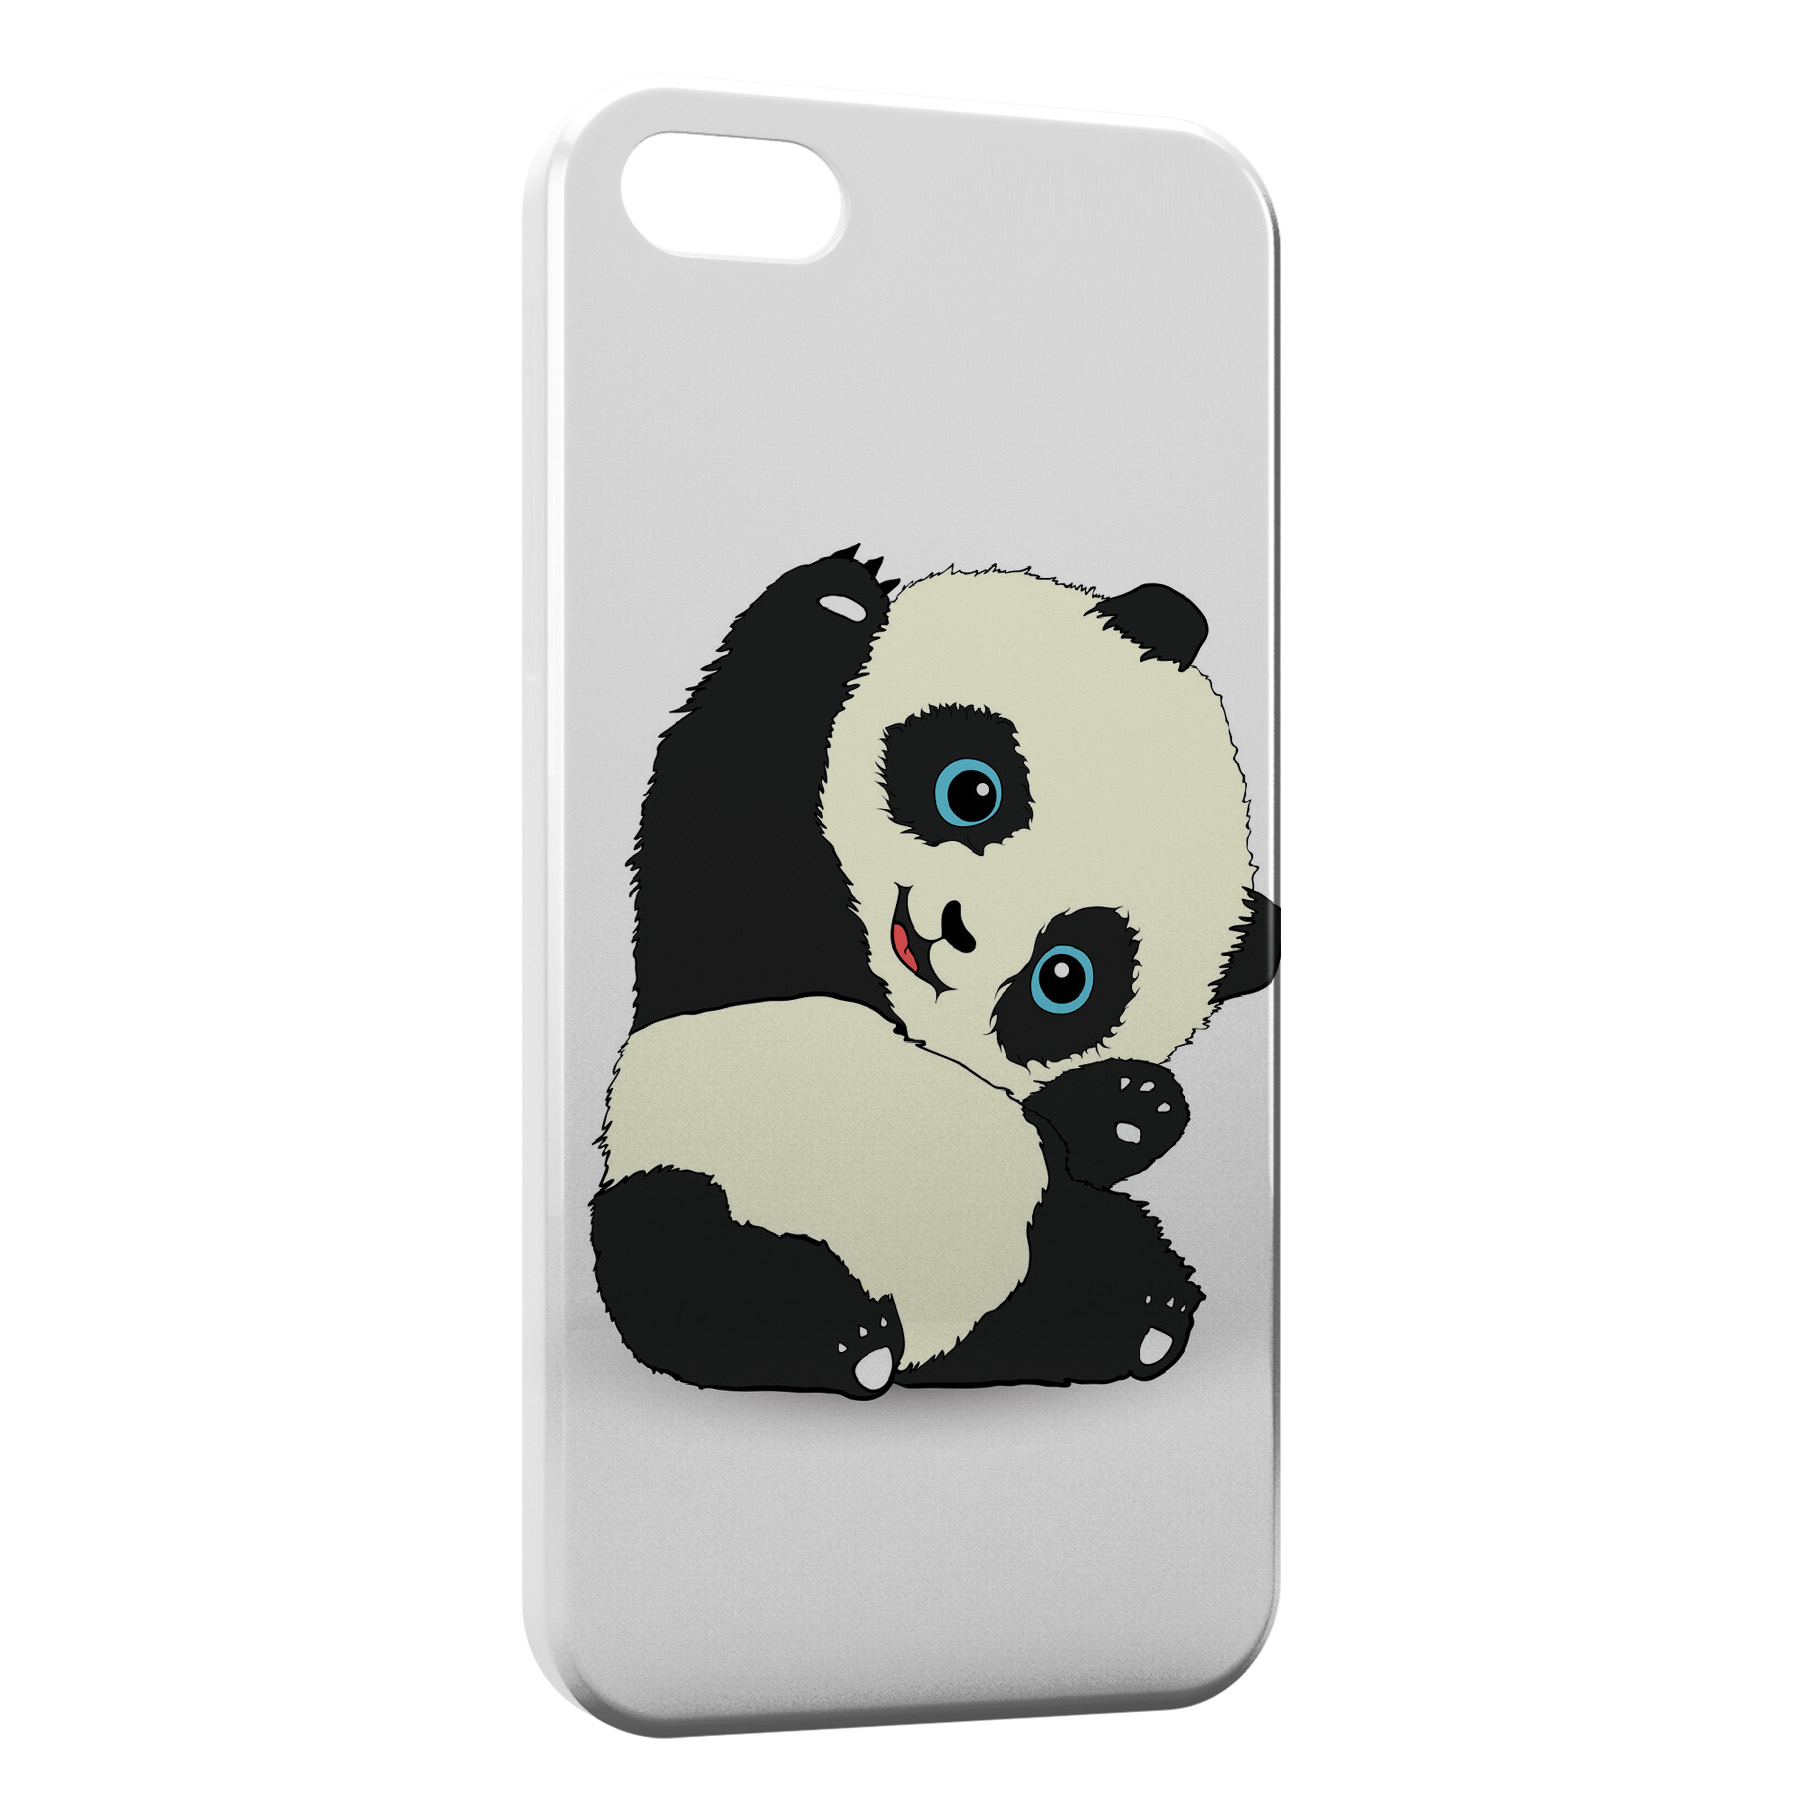 Coque iPhone 5/5S/SE Panda Kawaii Cute